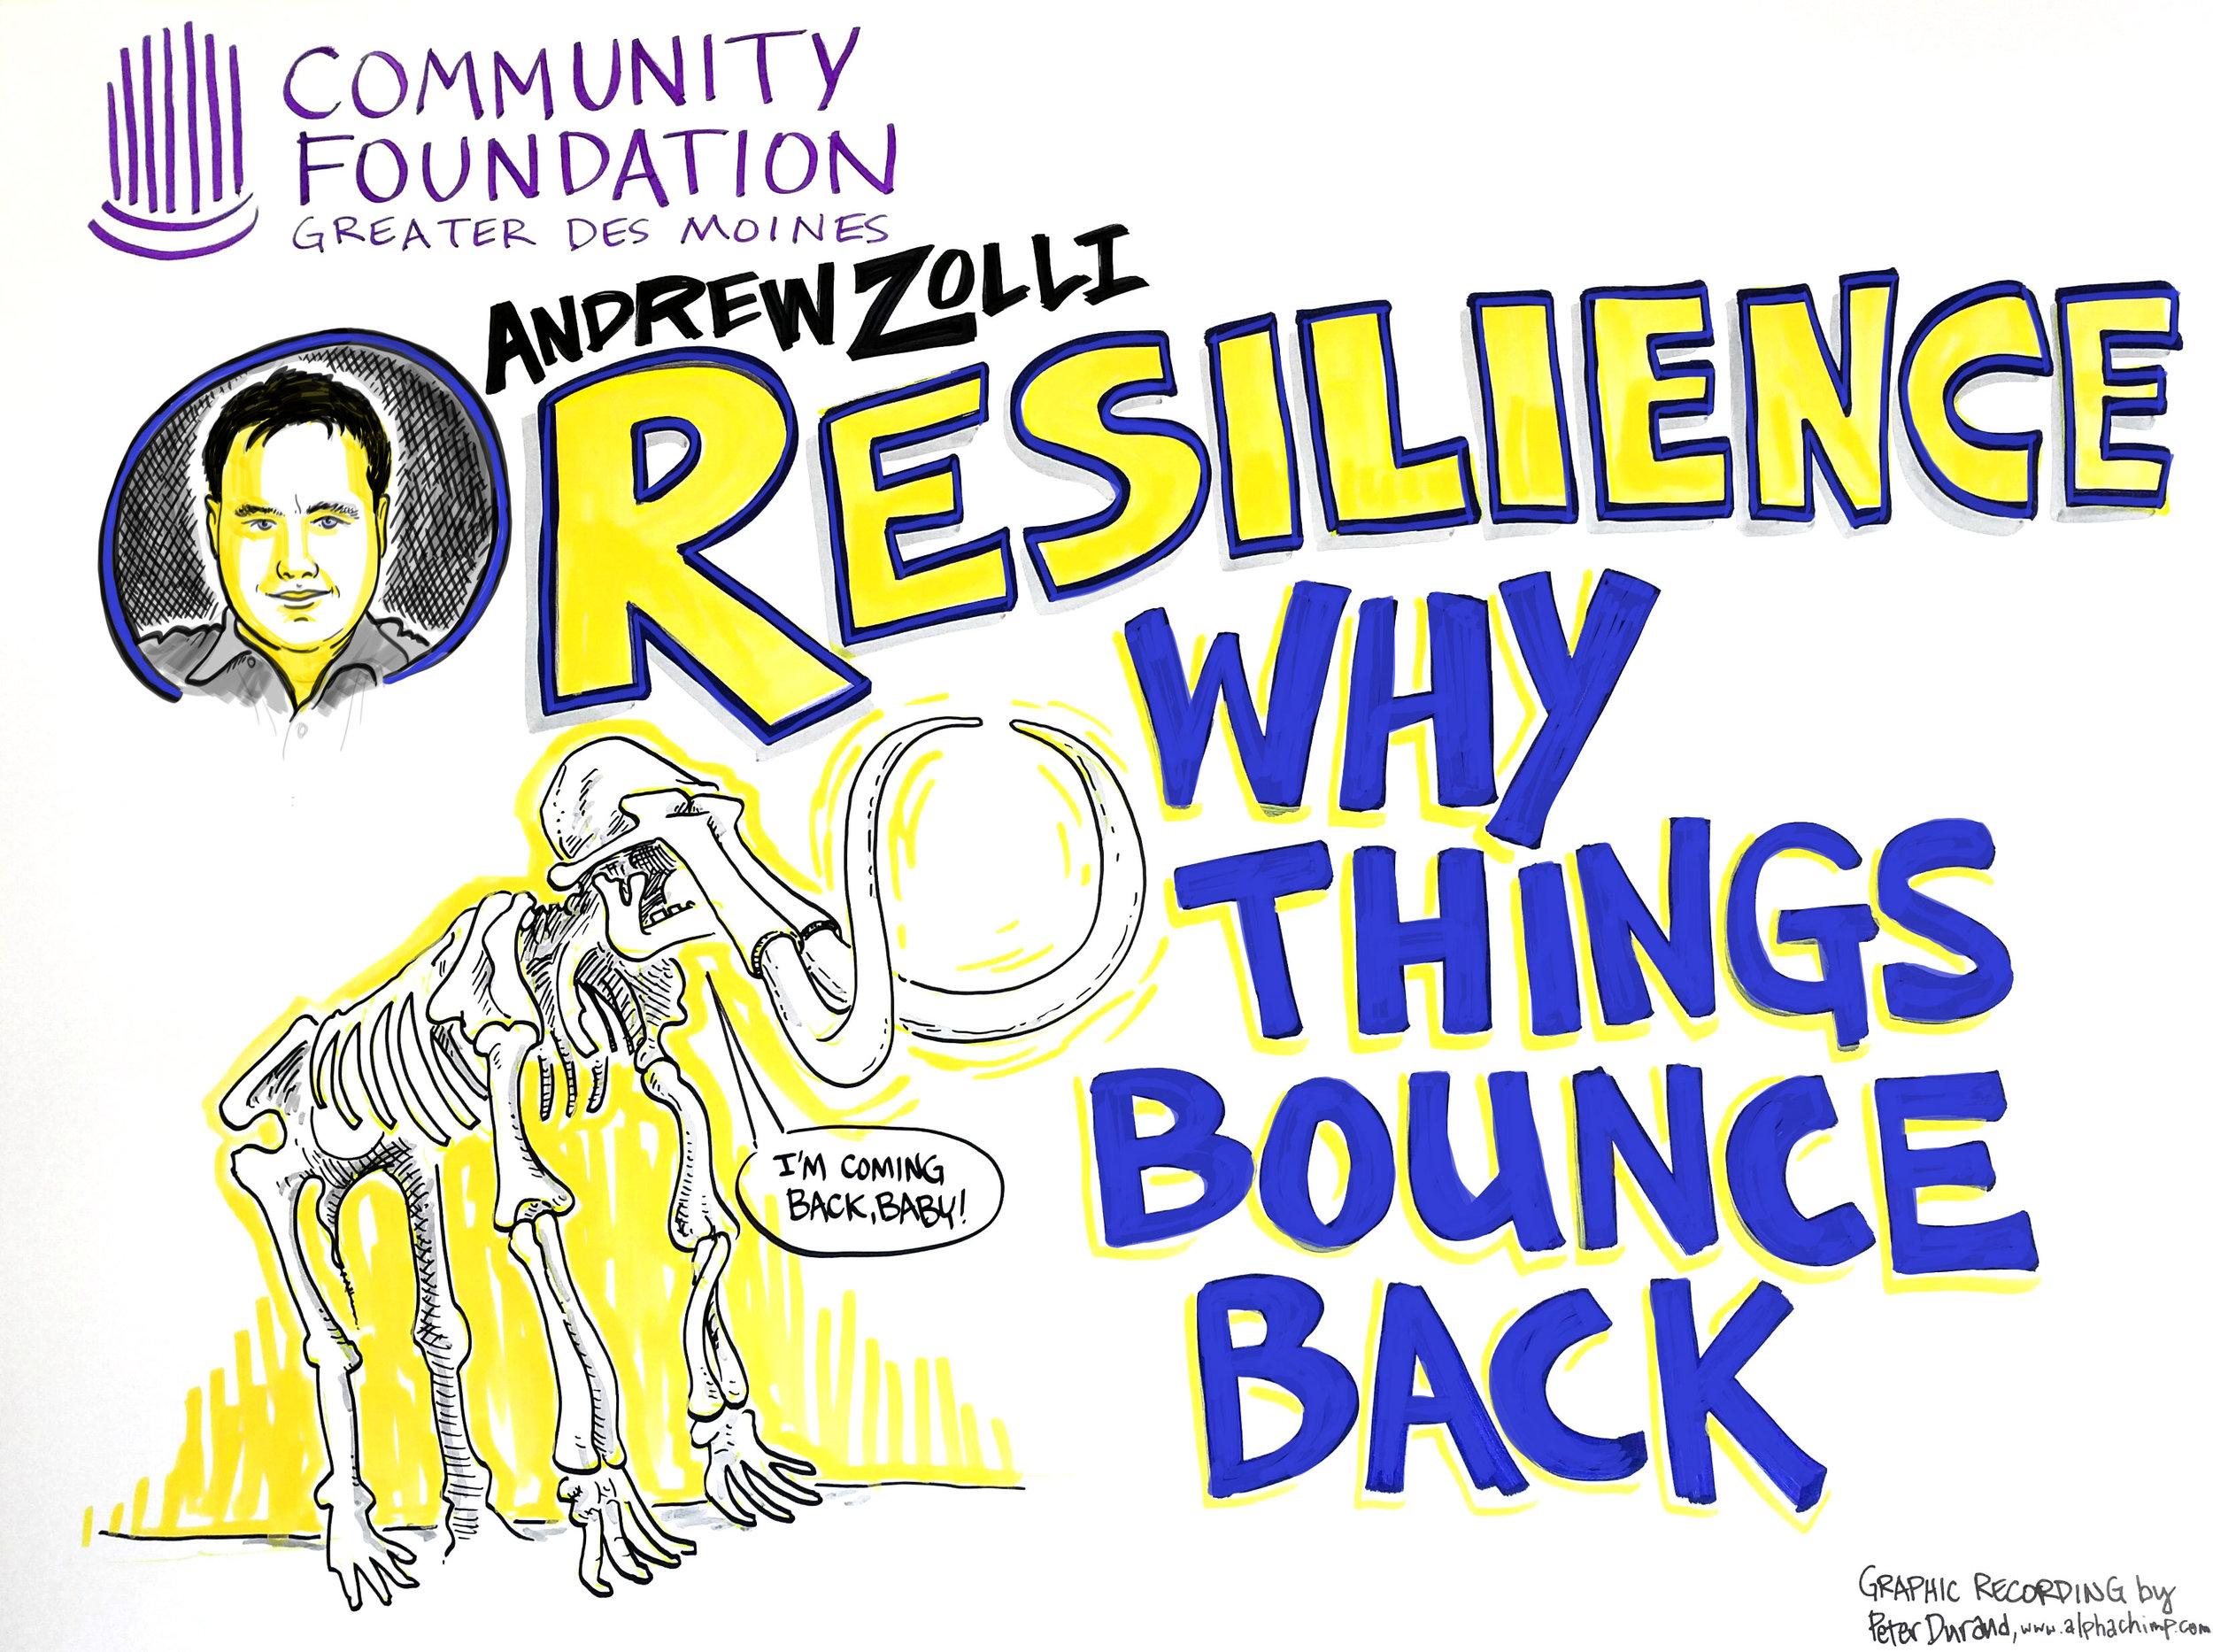 01-Andrew-Zolli-Resilience.jpg